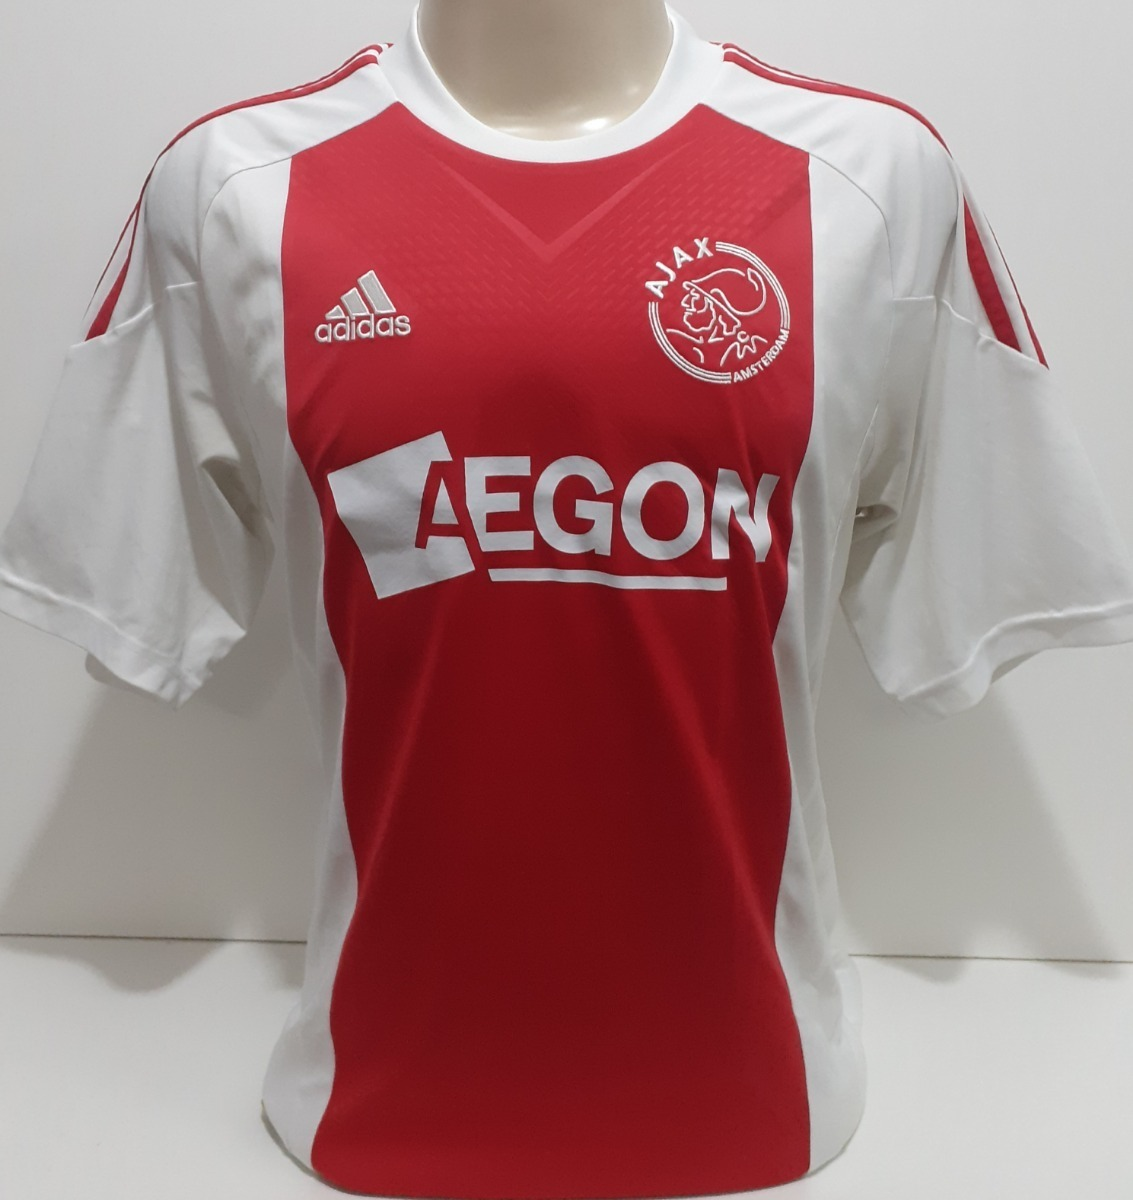 Adidas Original Adidas football shirt Ajax Amsterdam 200506